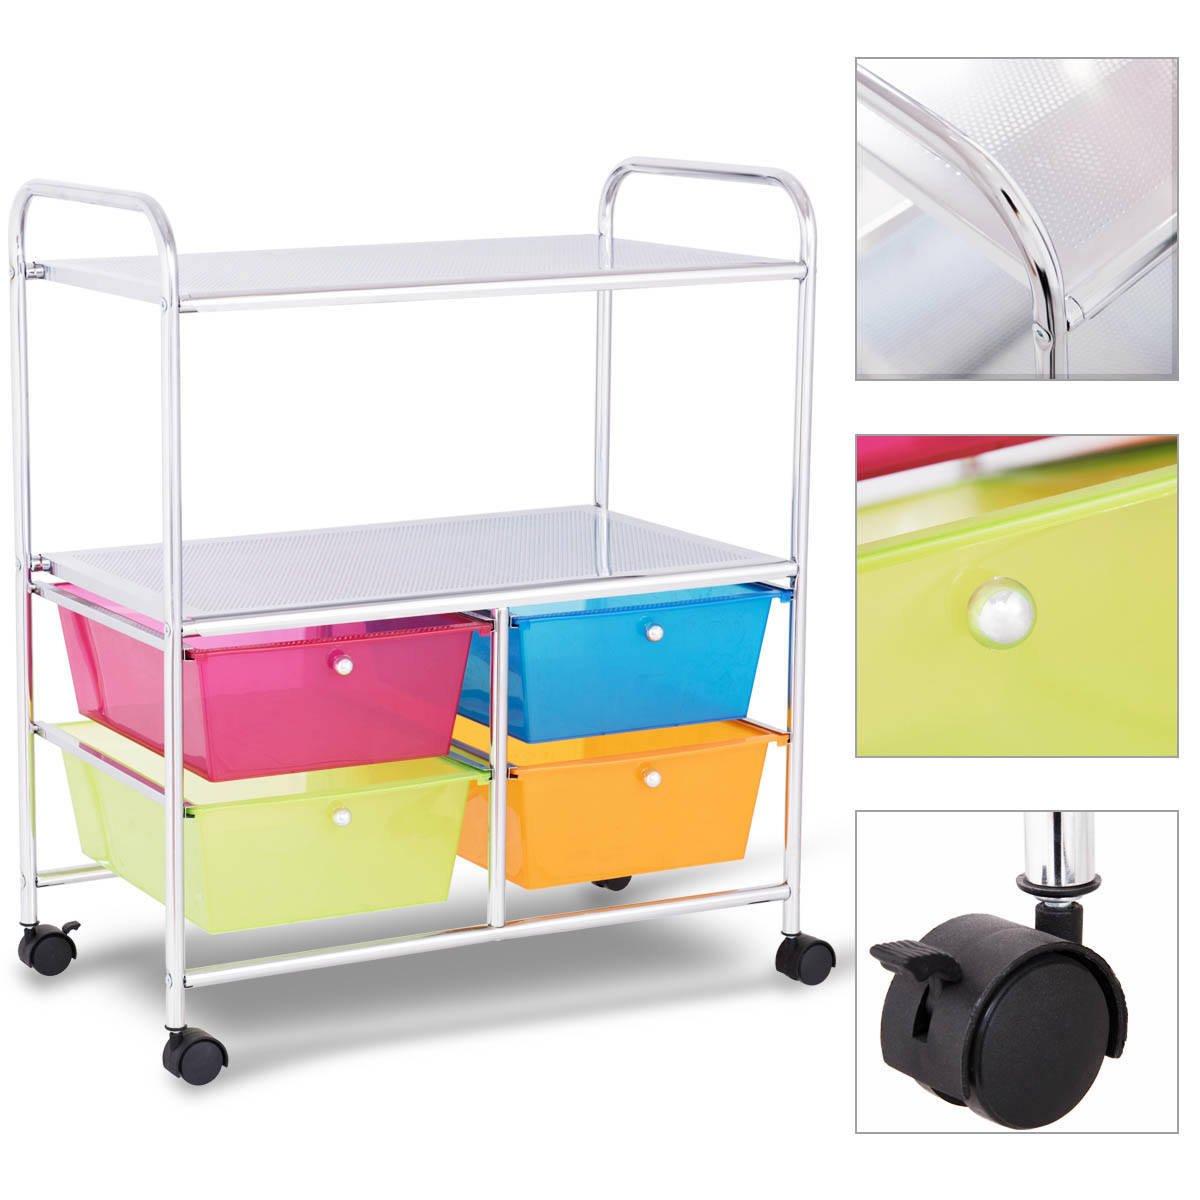 Giantex Rolling Storage Cart w/ 4 Drawers 2 Shelves Metal Rack Shelf Home Office School Beauty Salon Utility Organizer Cart with Wheels (Blue Green Orange & Red) by Giantex (Image #6)